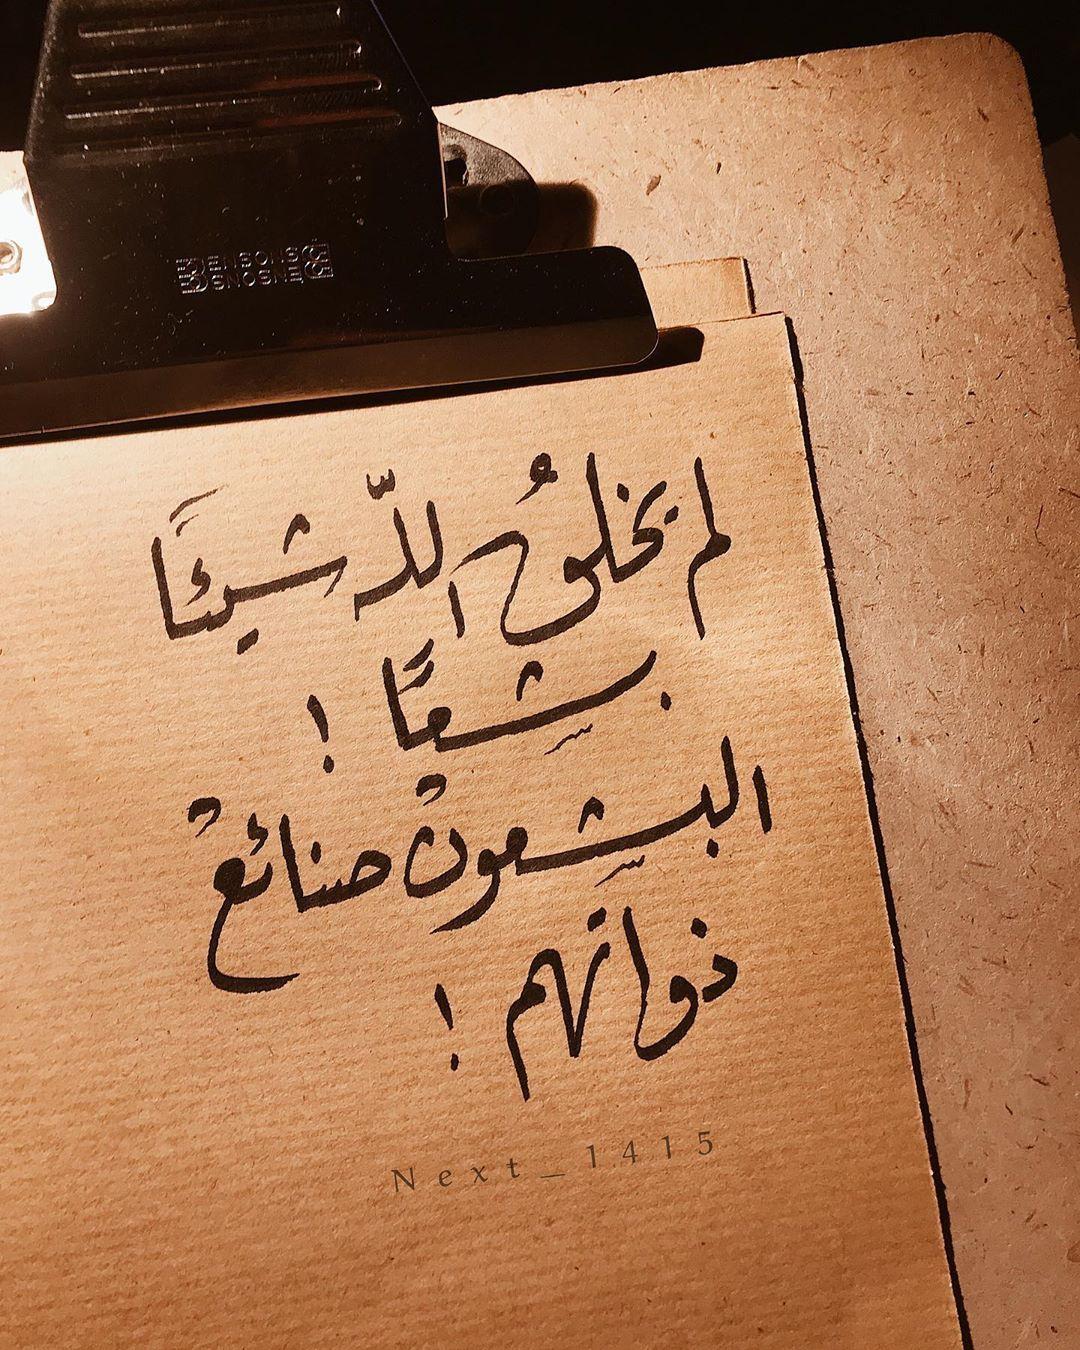 لم يخلق الله شيئا بشعا Holy Quotes Arabic Love Quotes Mood Quotes